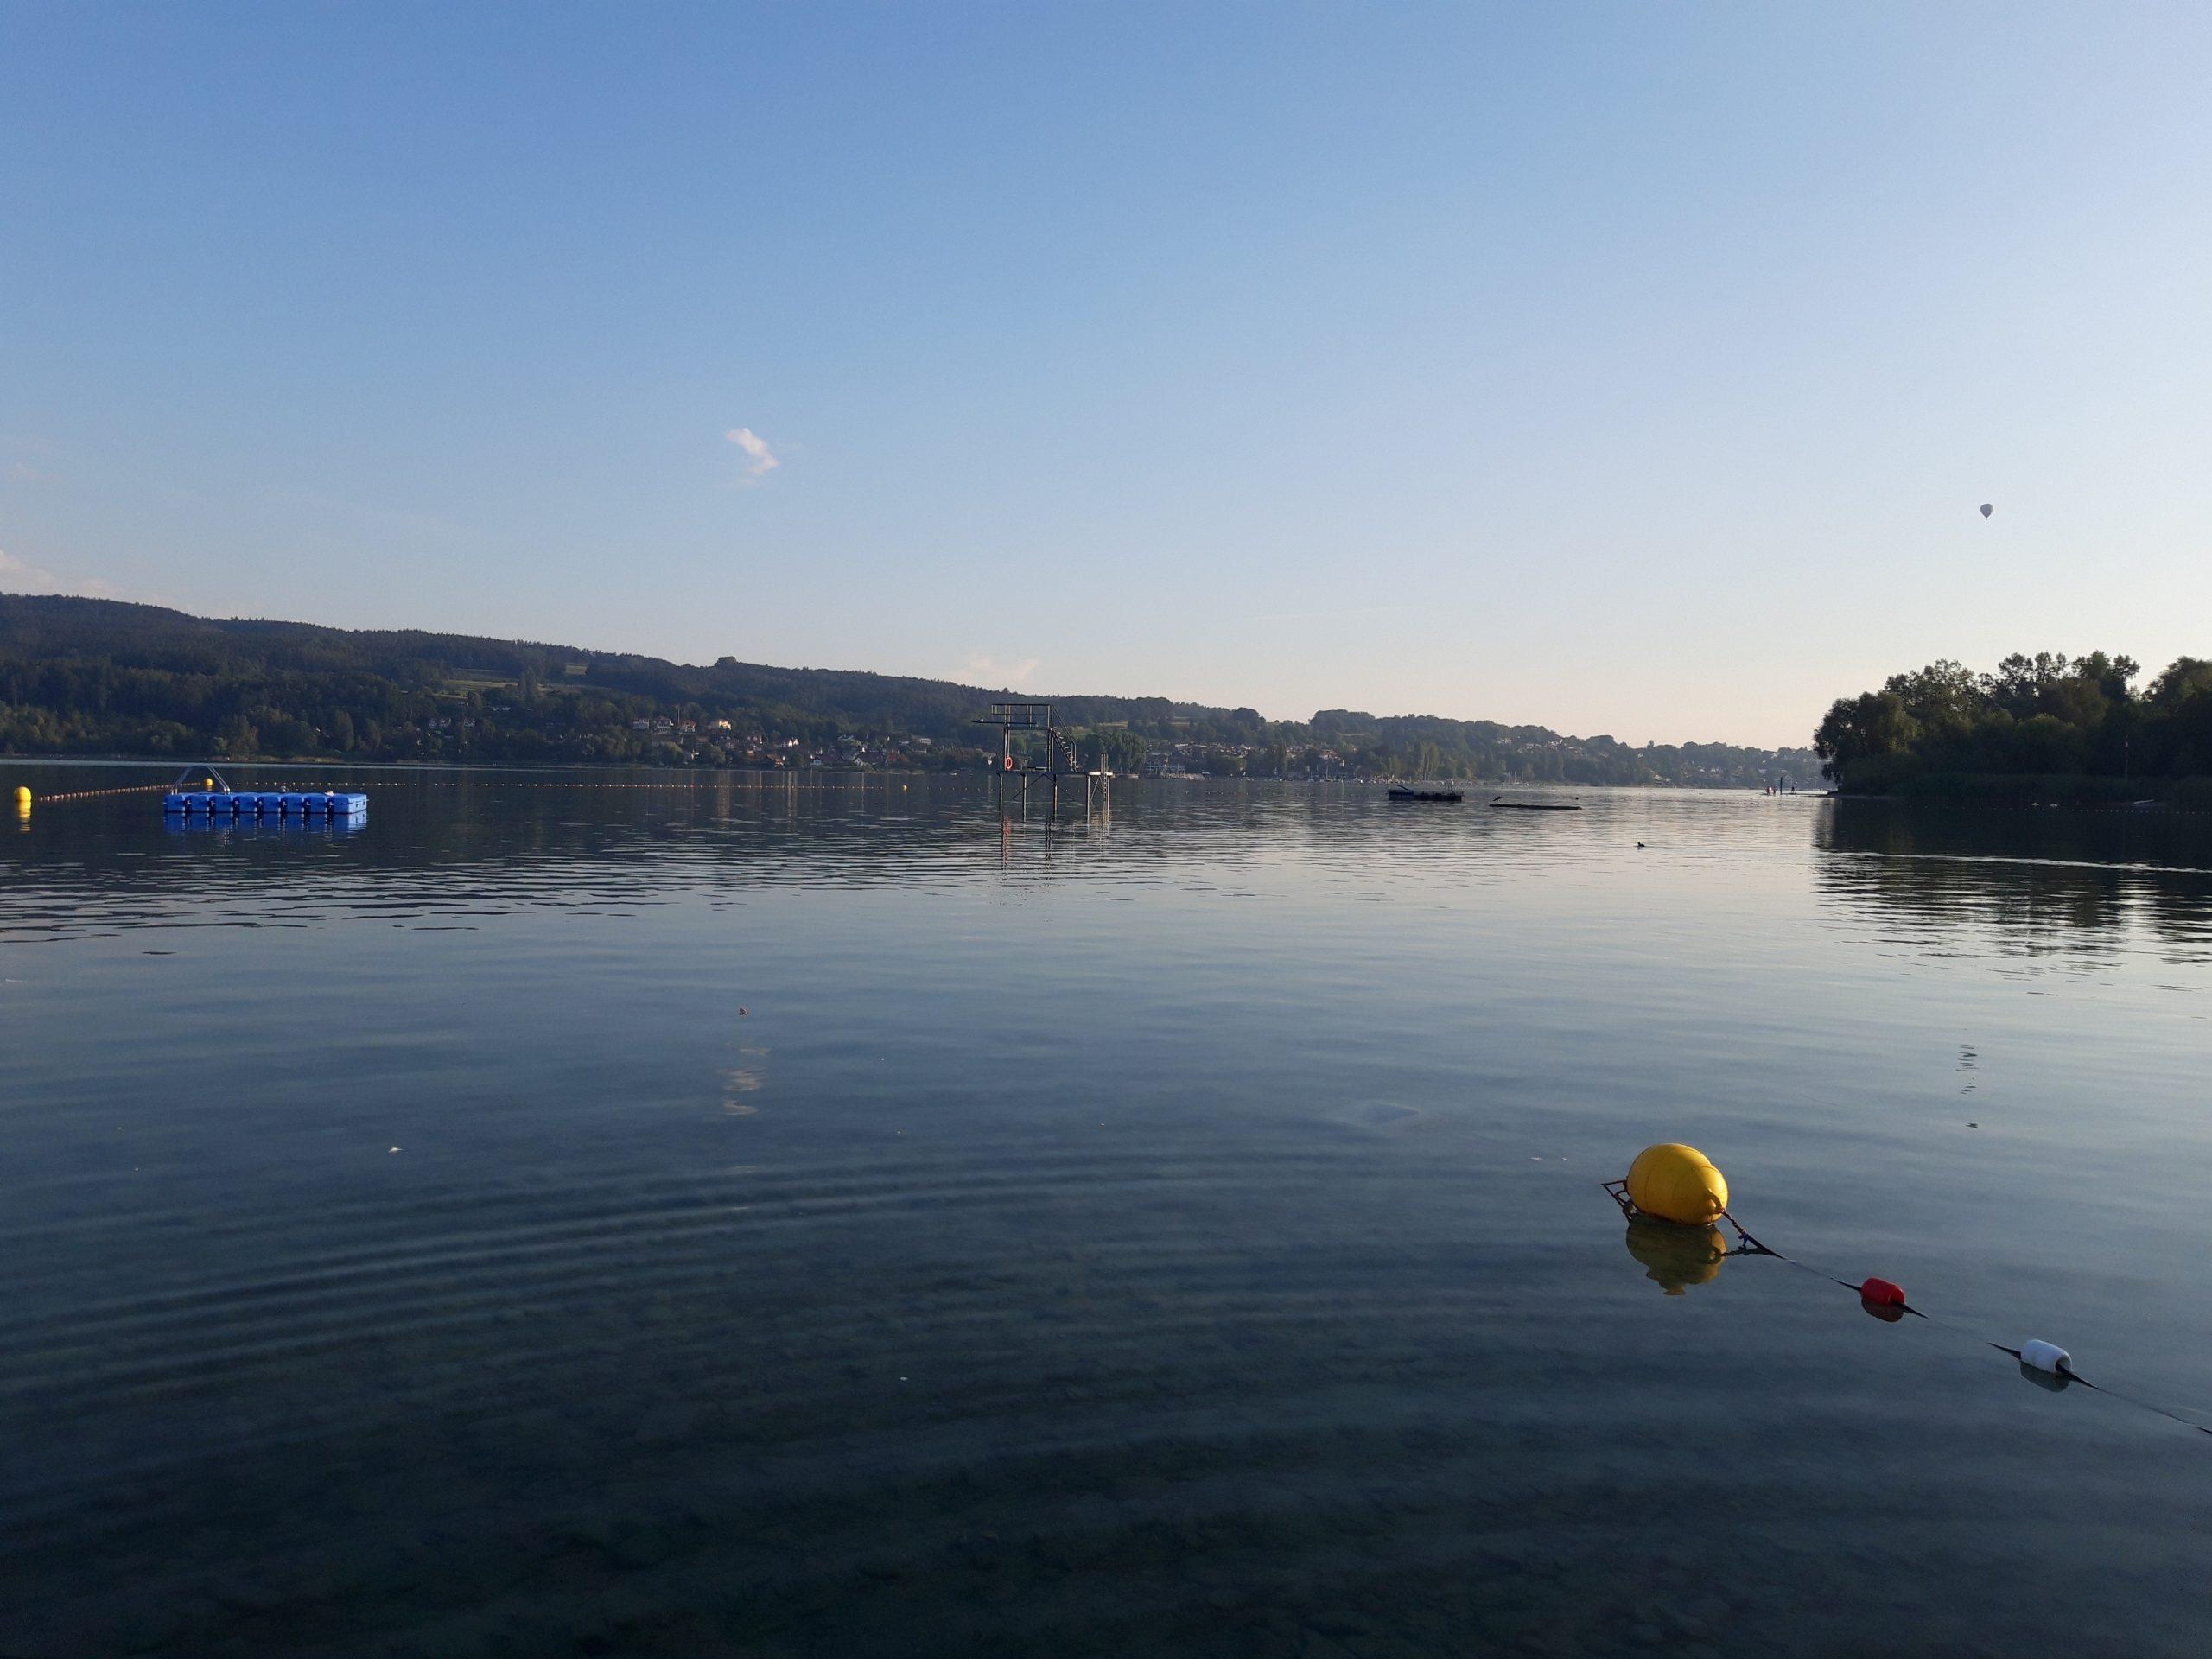 Galerie – Trainingsweekend Ocean bei Schaffhausen 2020